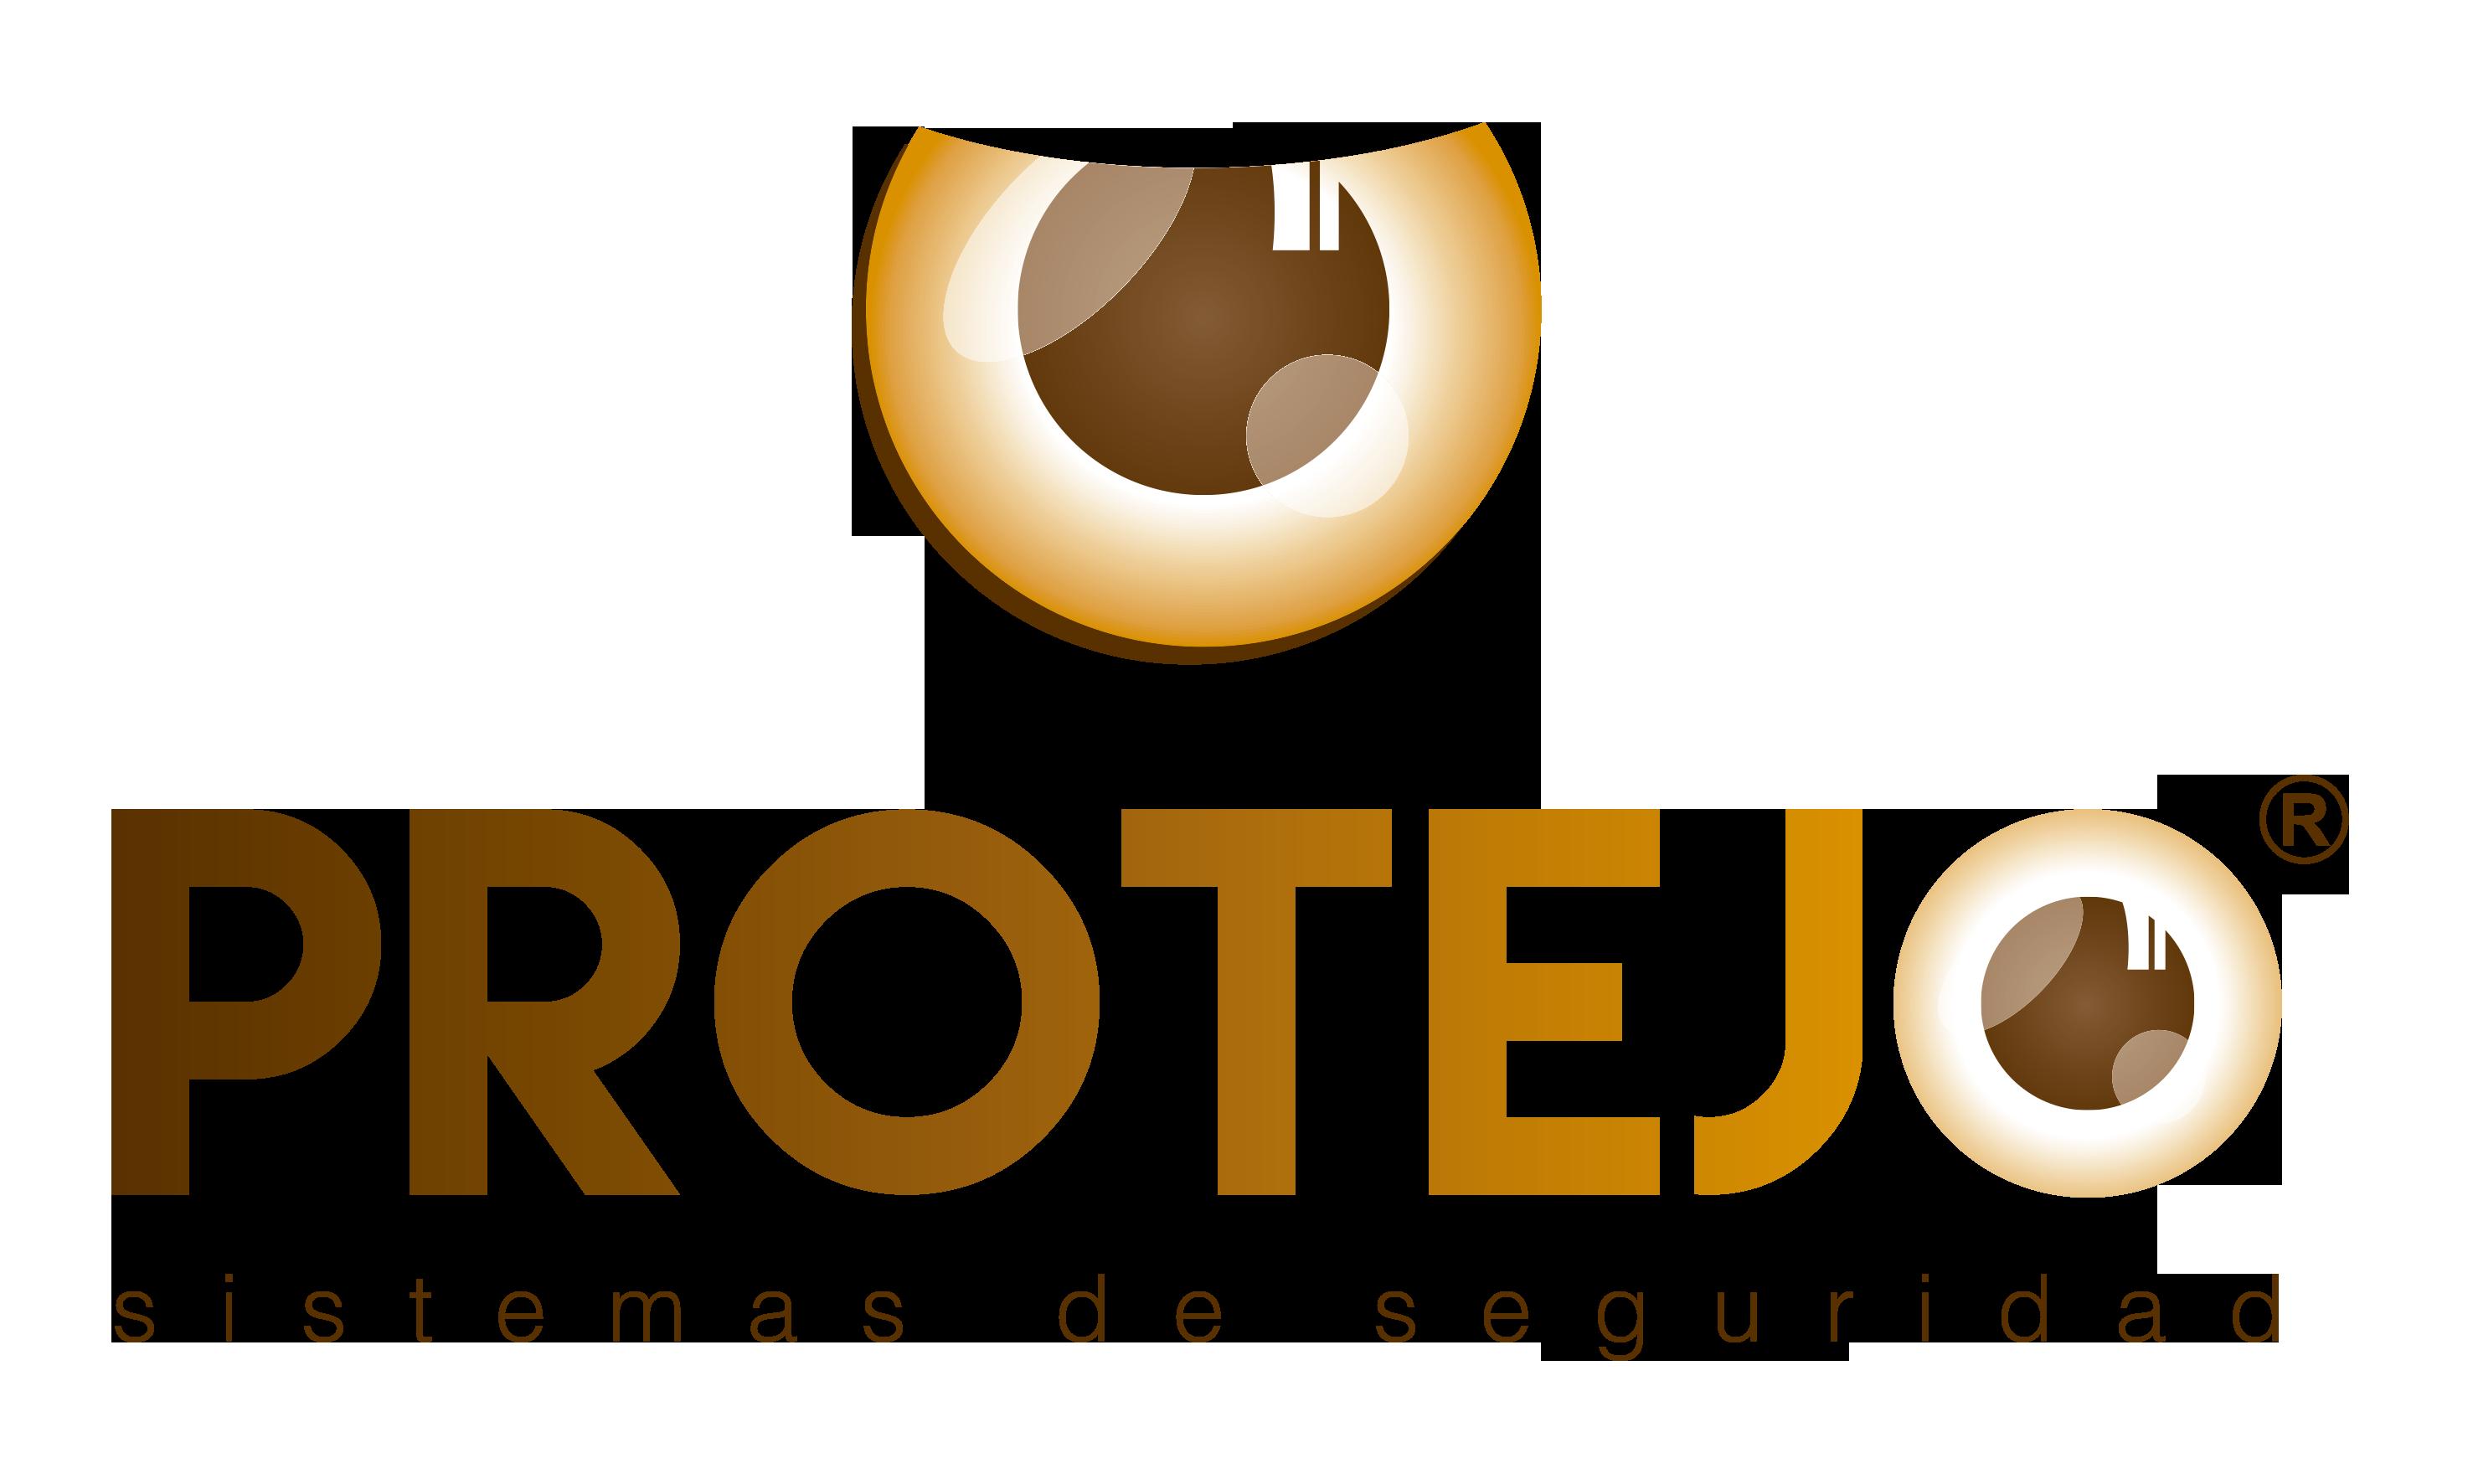 Protejo Logo PNG